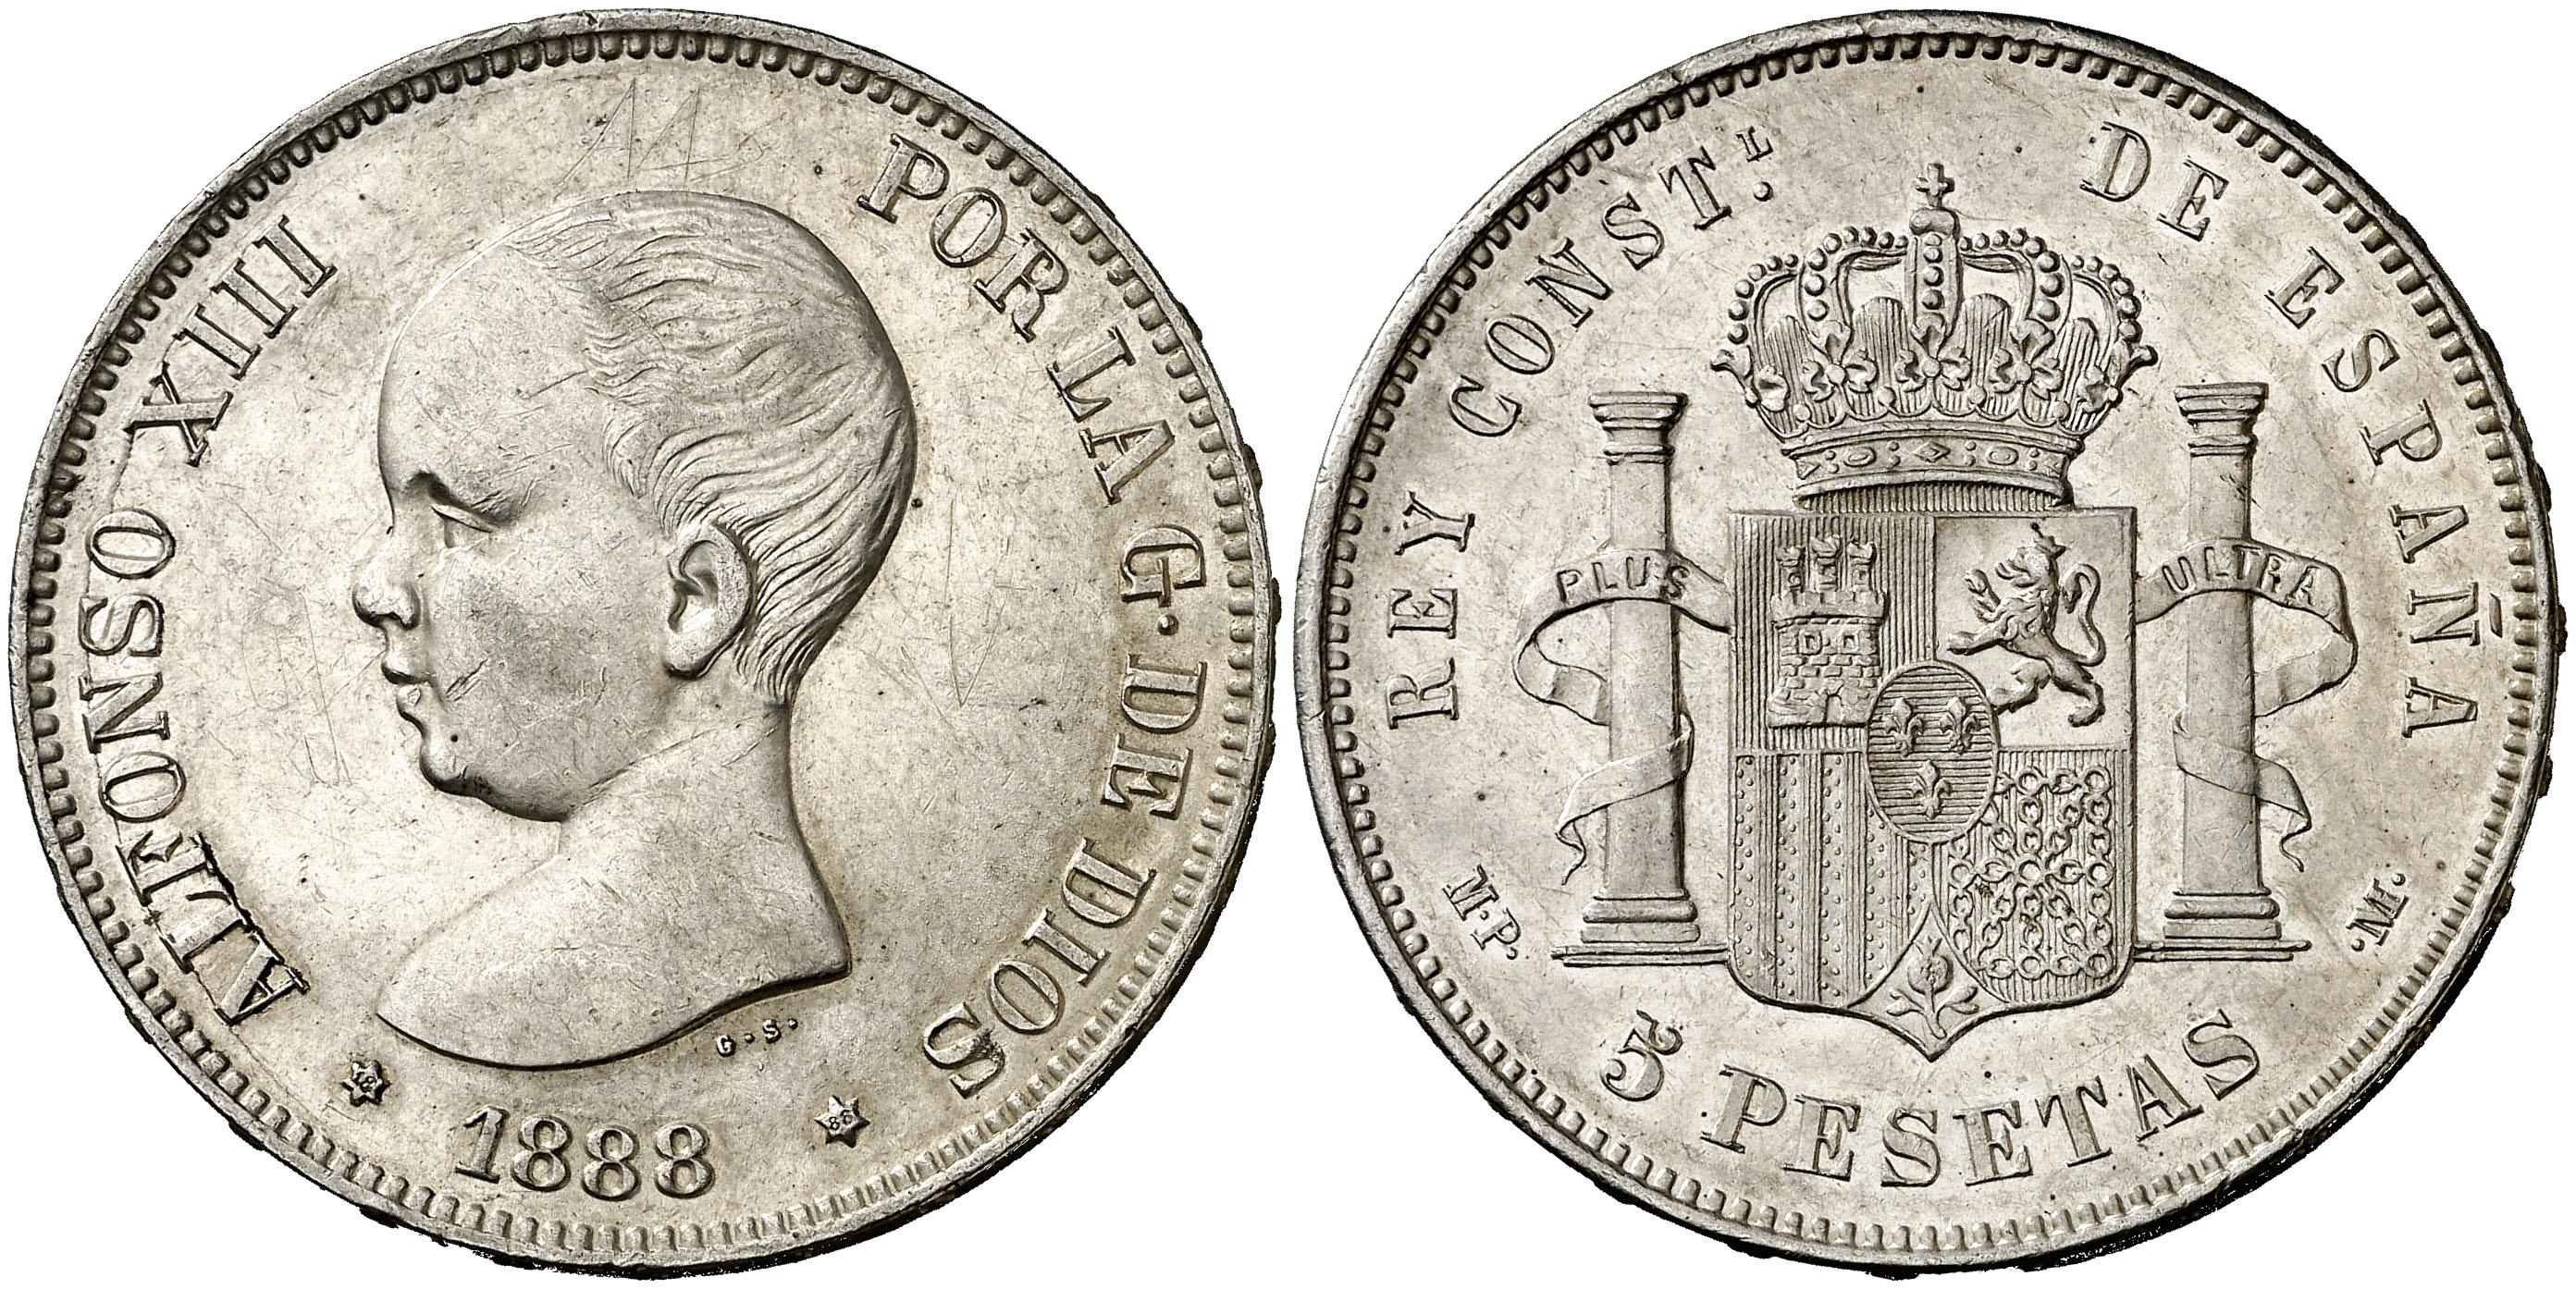 5 pesetas mbc+